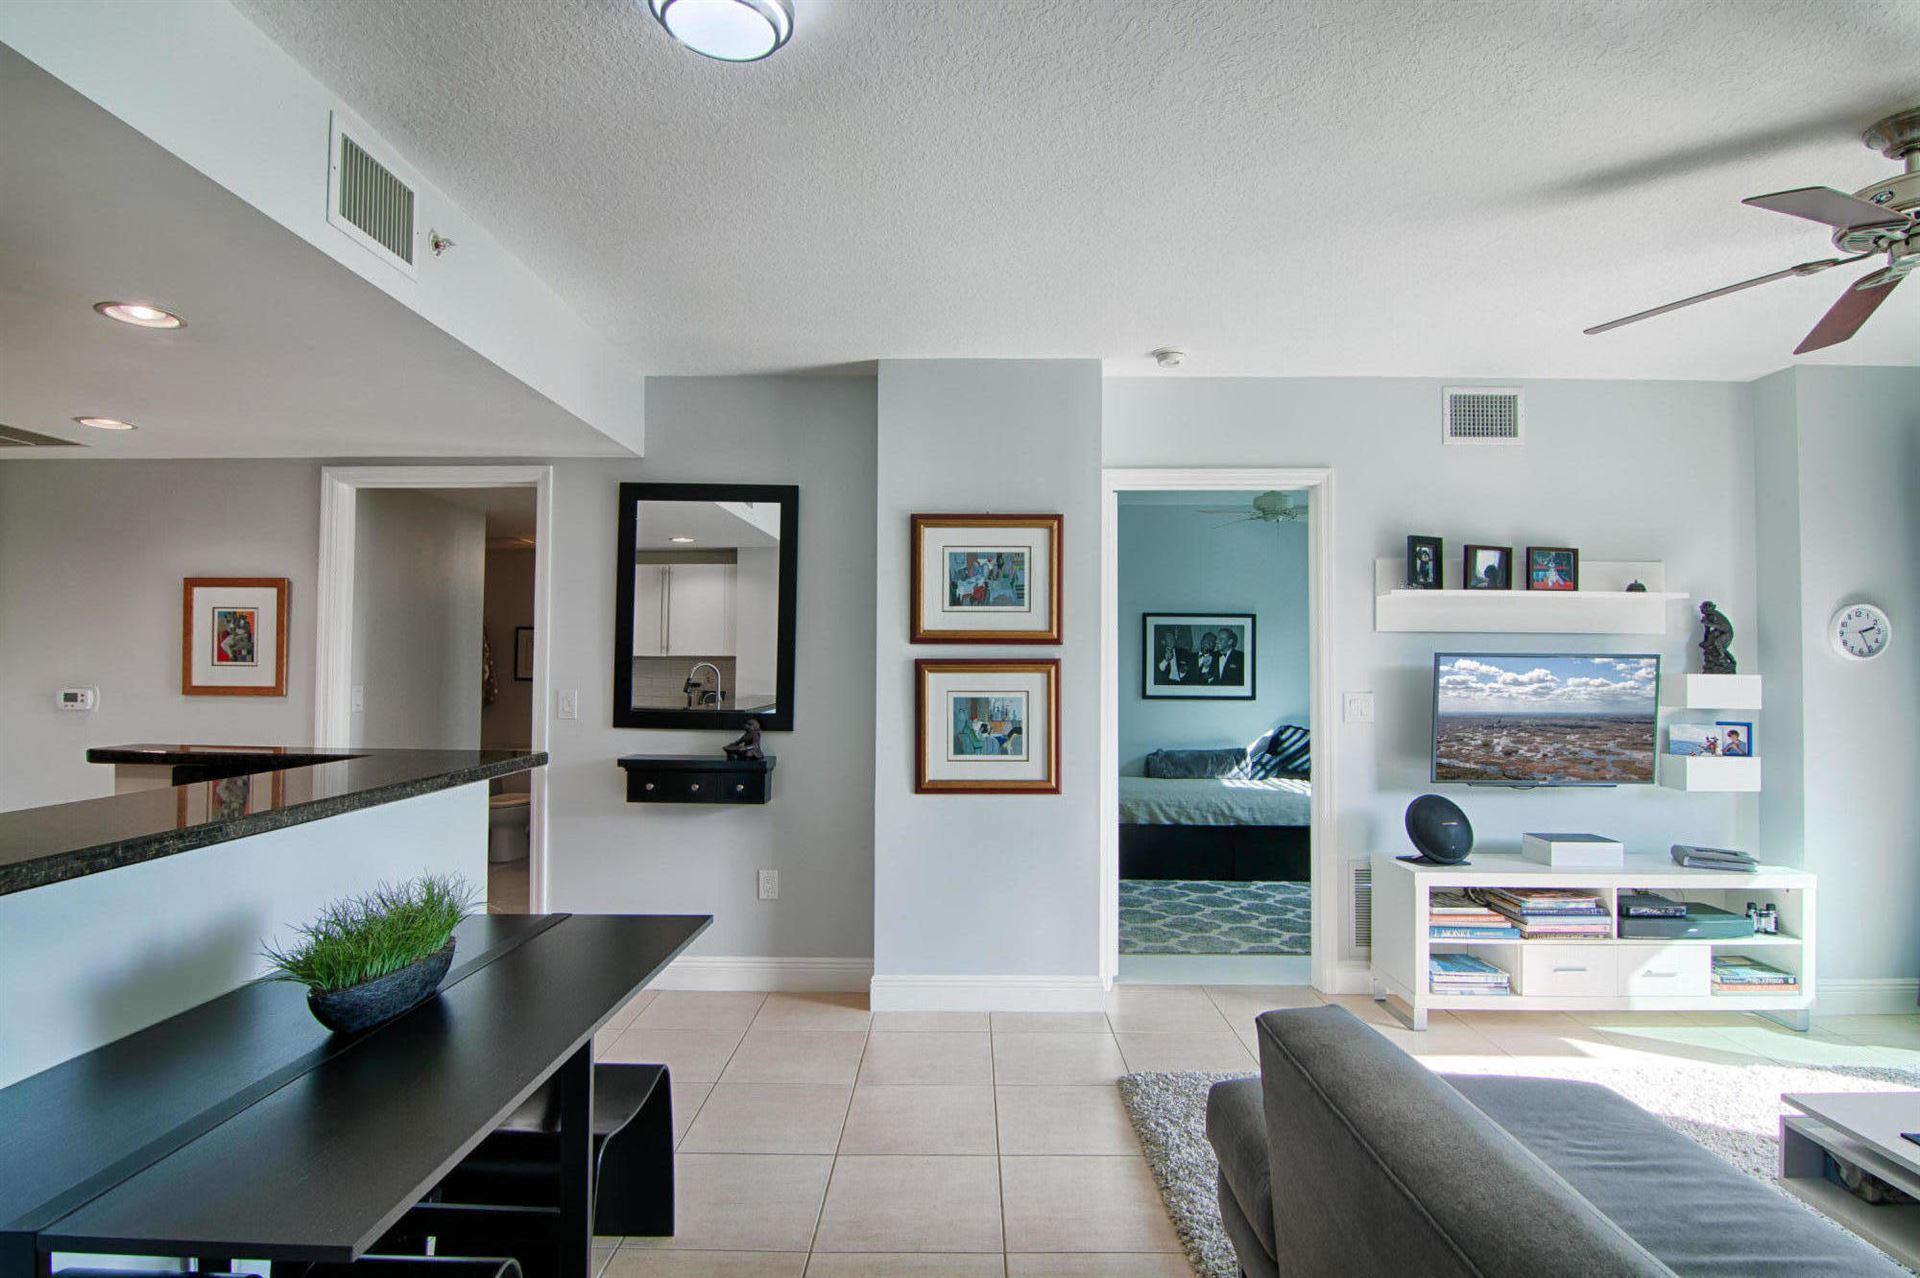 610 Clematis Street #230, West Palm Beach, FL 33401 - #: RX-10592699